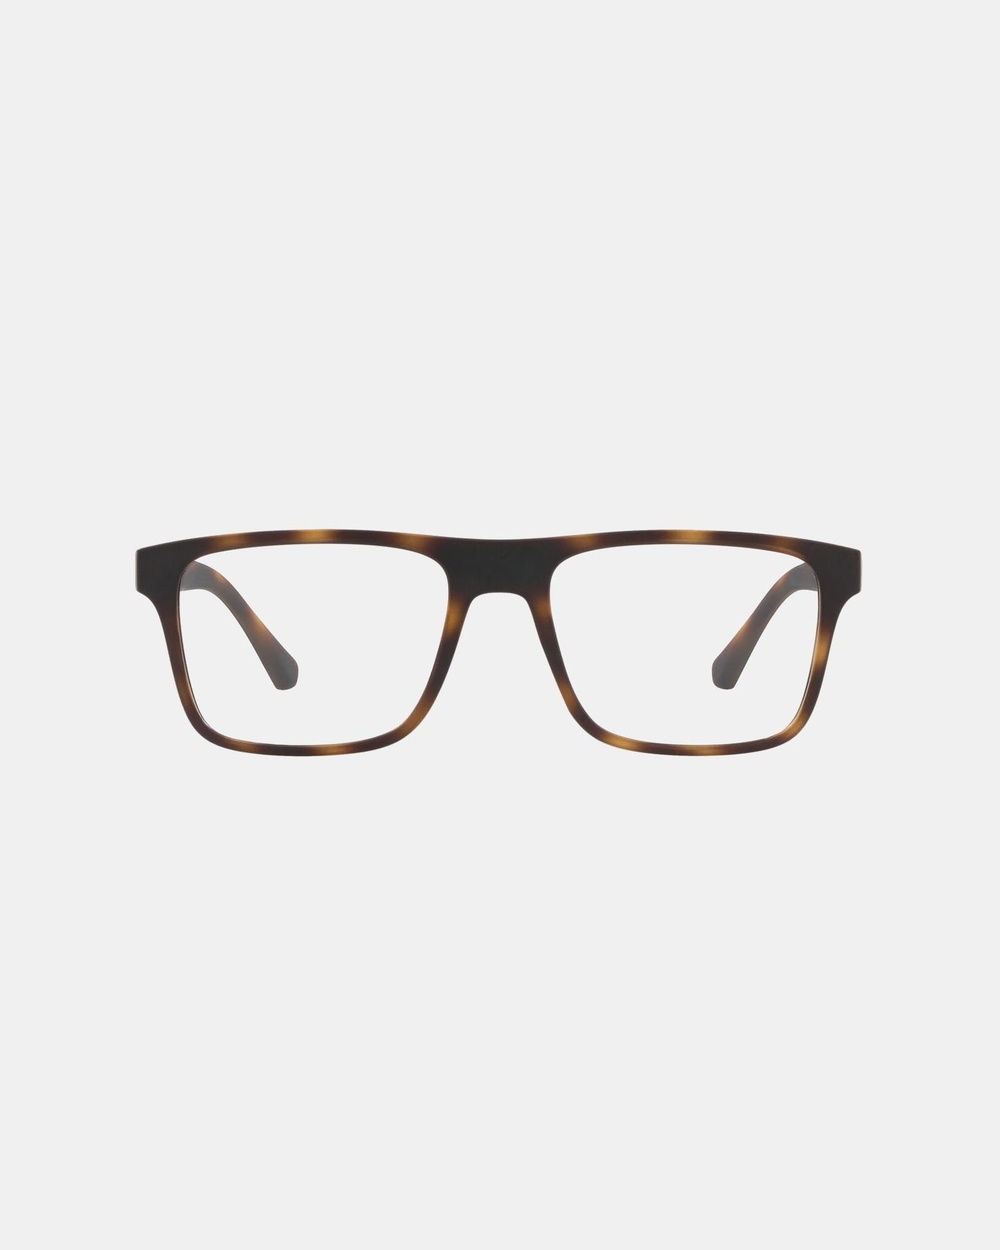 Emporio Armani Injected Man Clip On Set Sunglasses Havana Clip-On